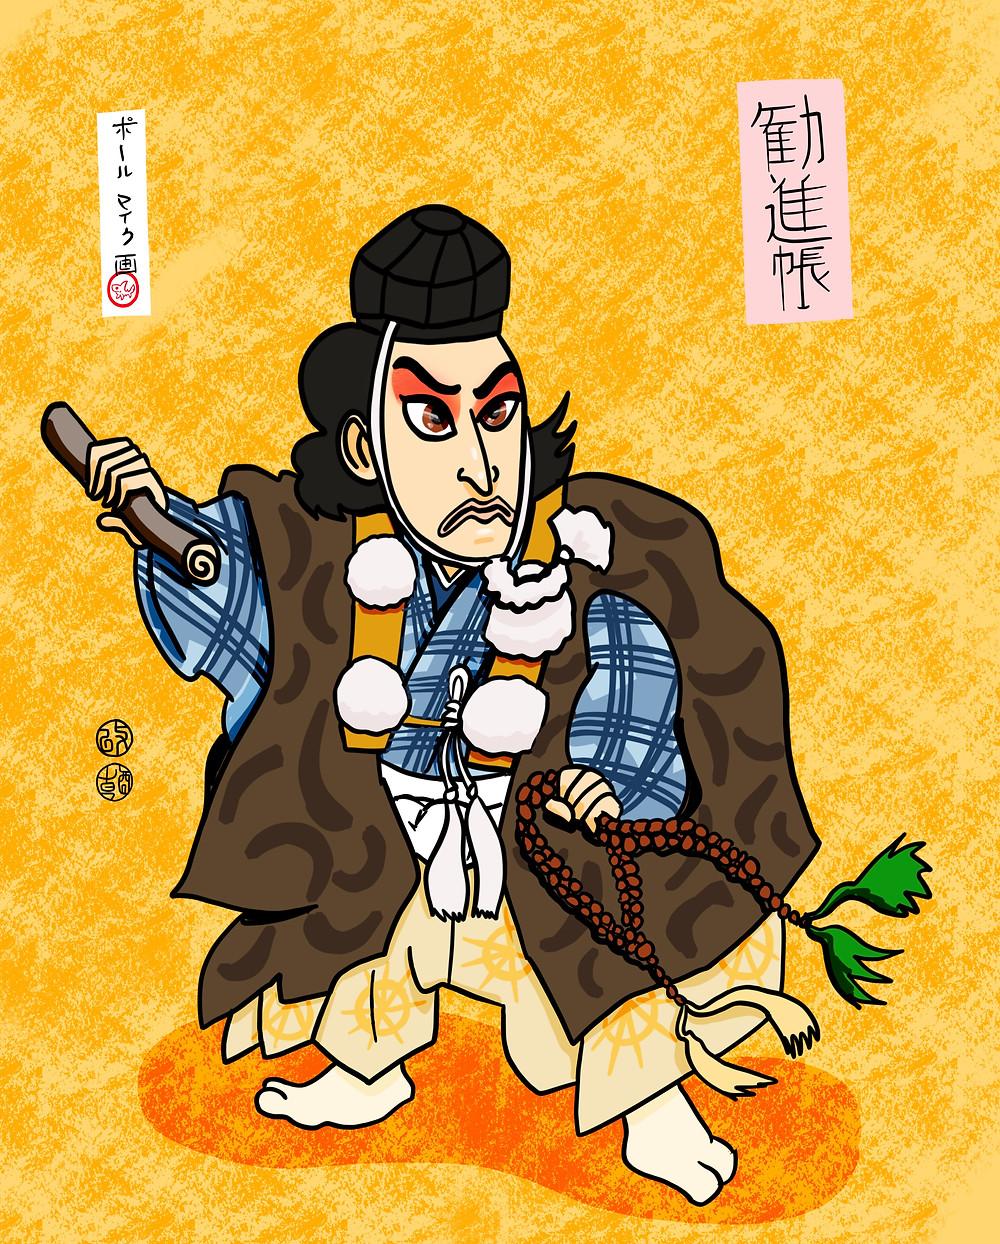 Benkei at Atakanoseki, from the Kabuki play Kanjincho